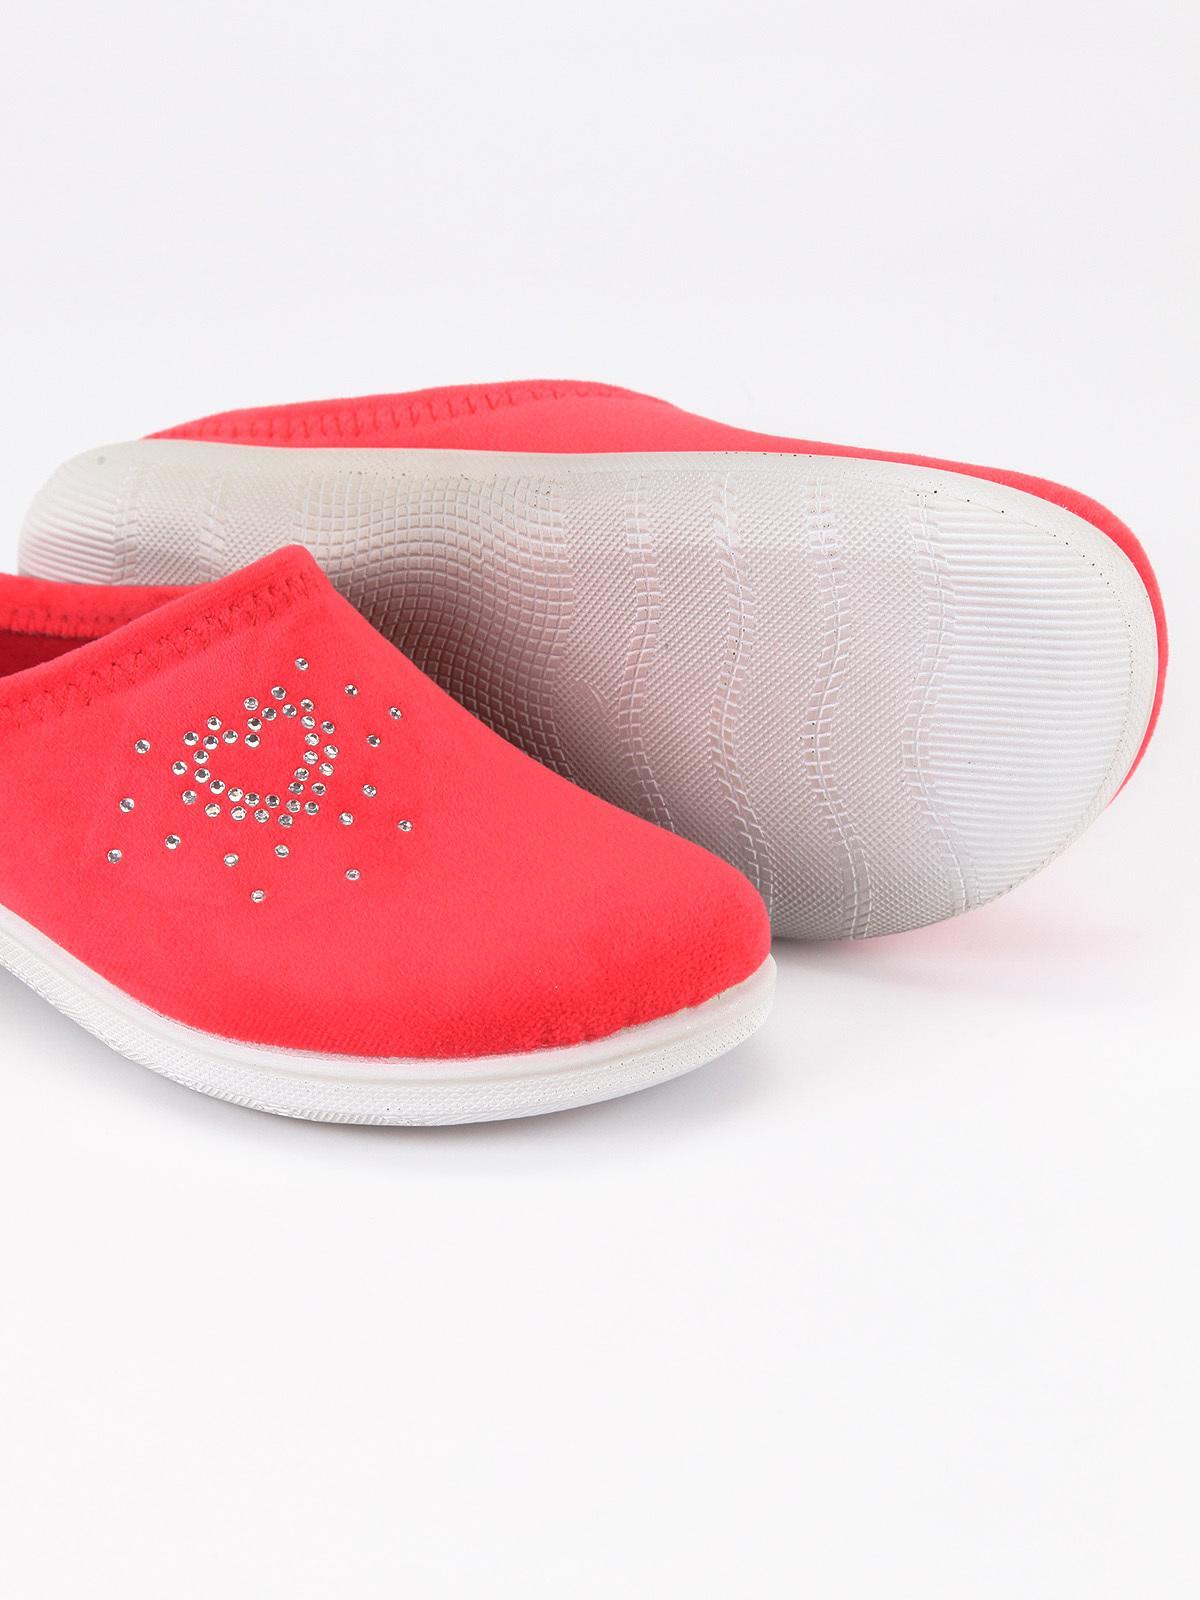 pantofole pelo n 33 converse